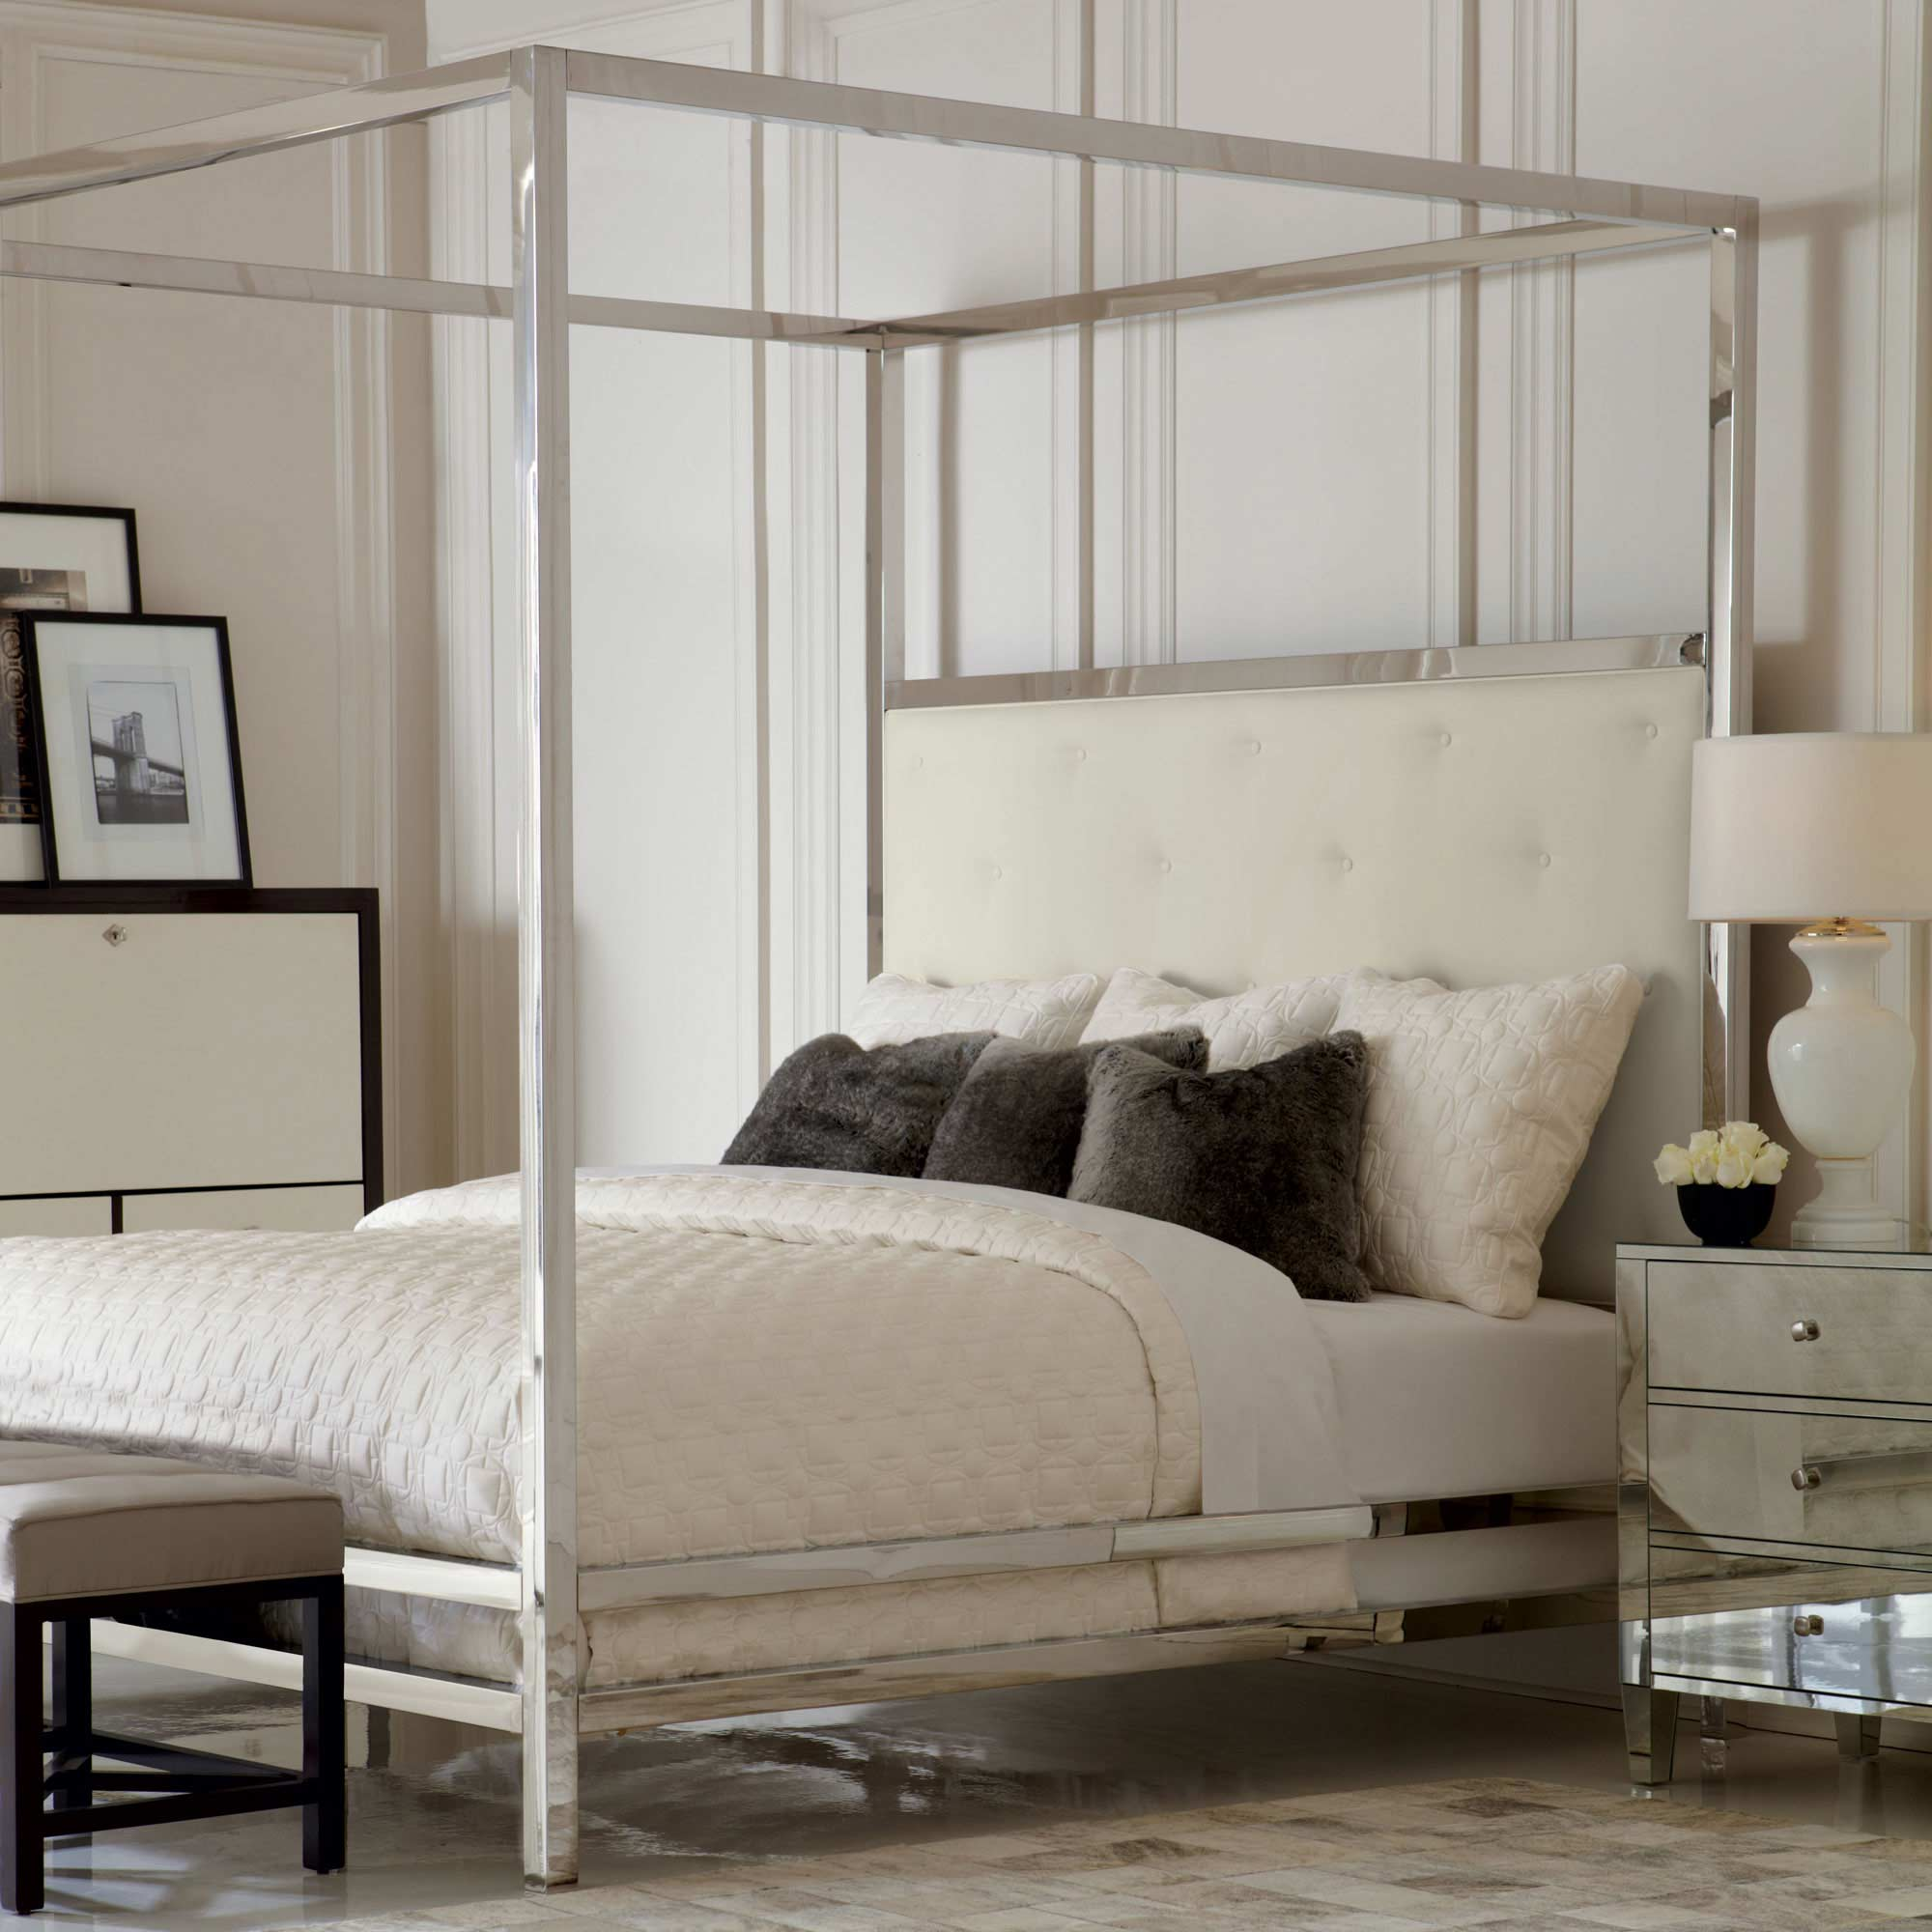 Landon_metal_poster_bed_Interiors_room